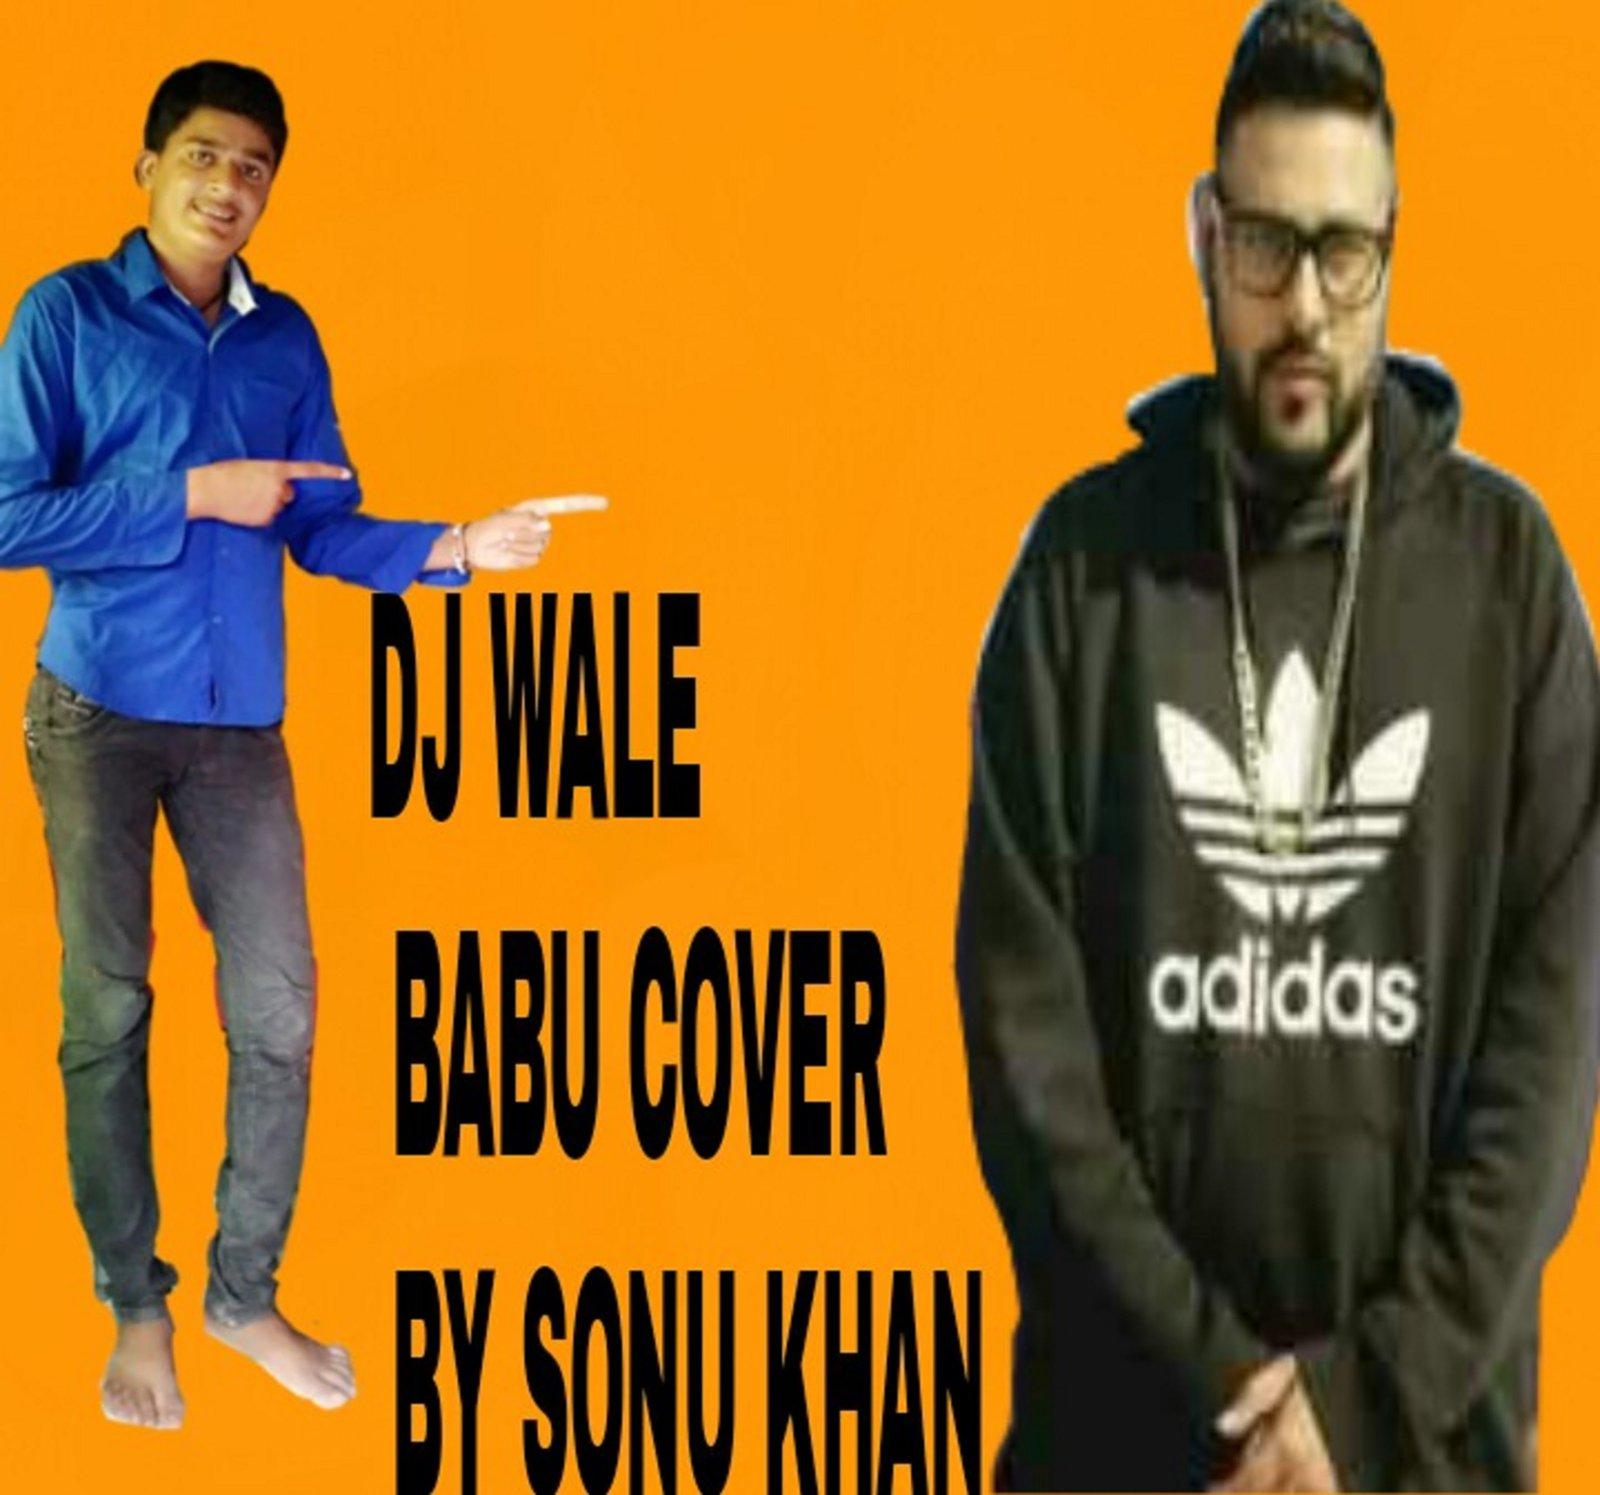 Dj wale babu video song download full hd 1080p